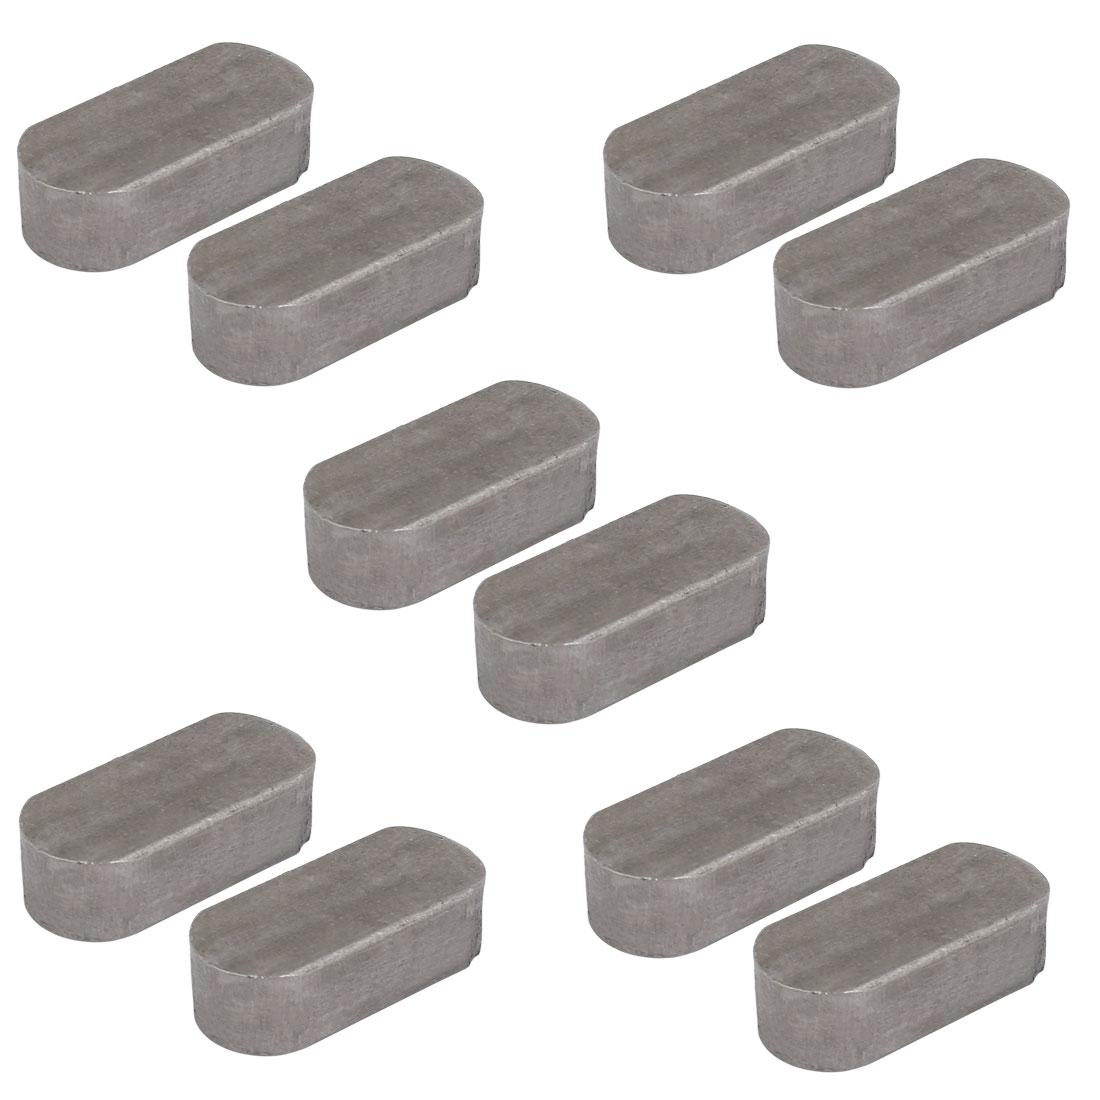 35mmx16mmx10mm Carbon Steel Key Stock To Lock Gears Pulleys 10pcs